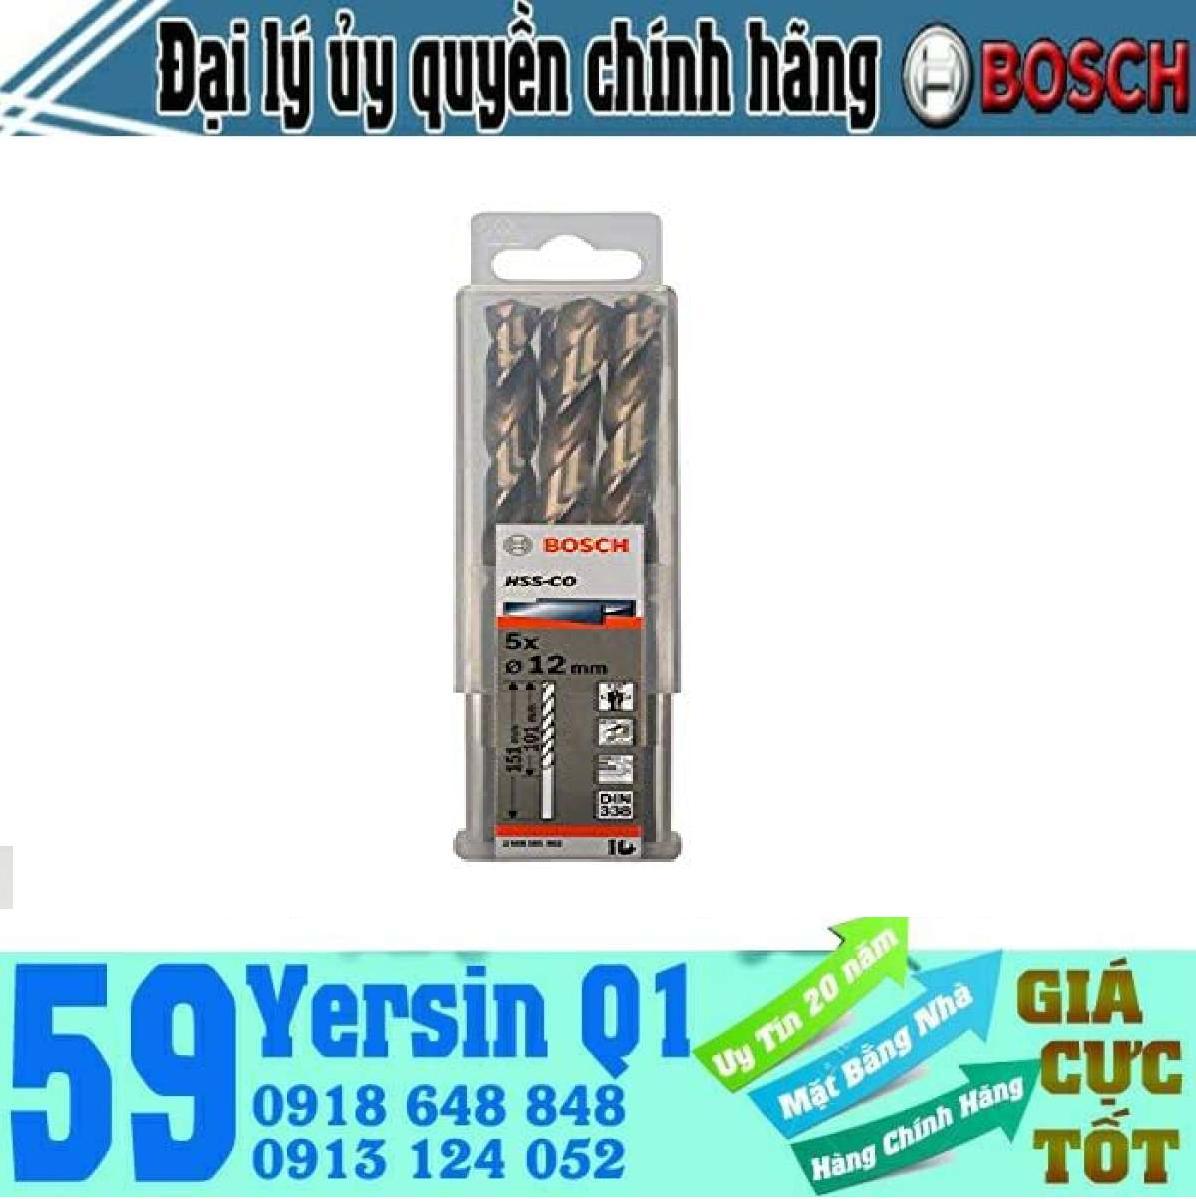 Mũi khoan Inox HSS-Co Bosch 12mm - 2608585903